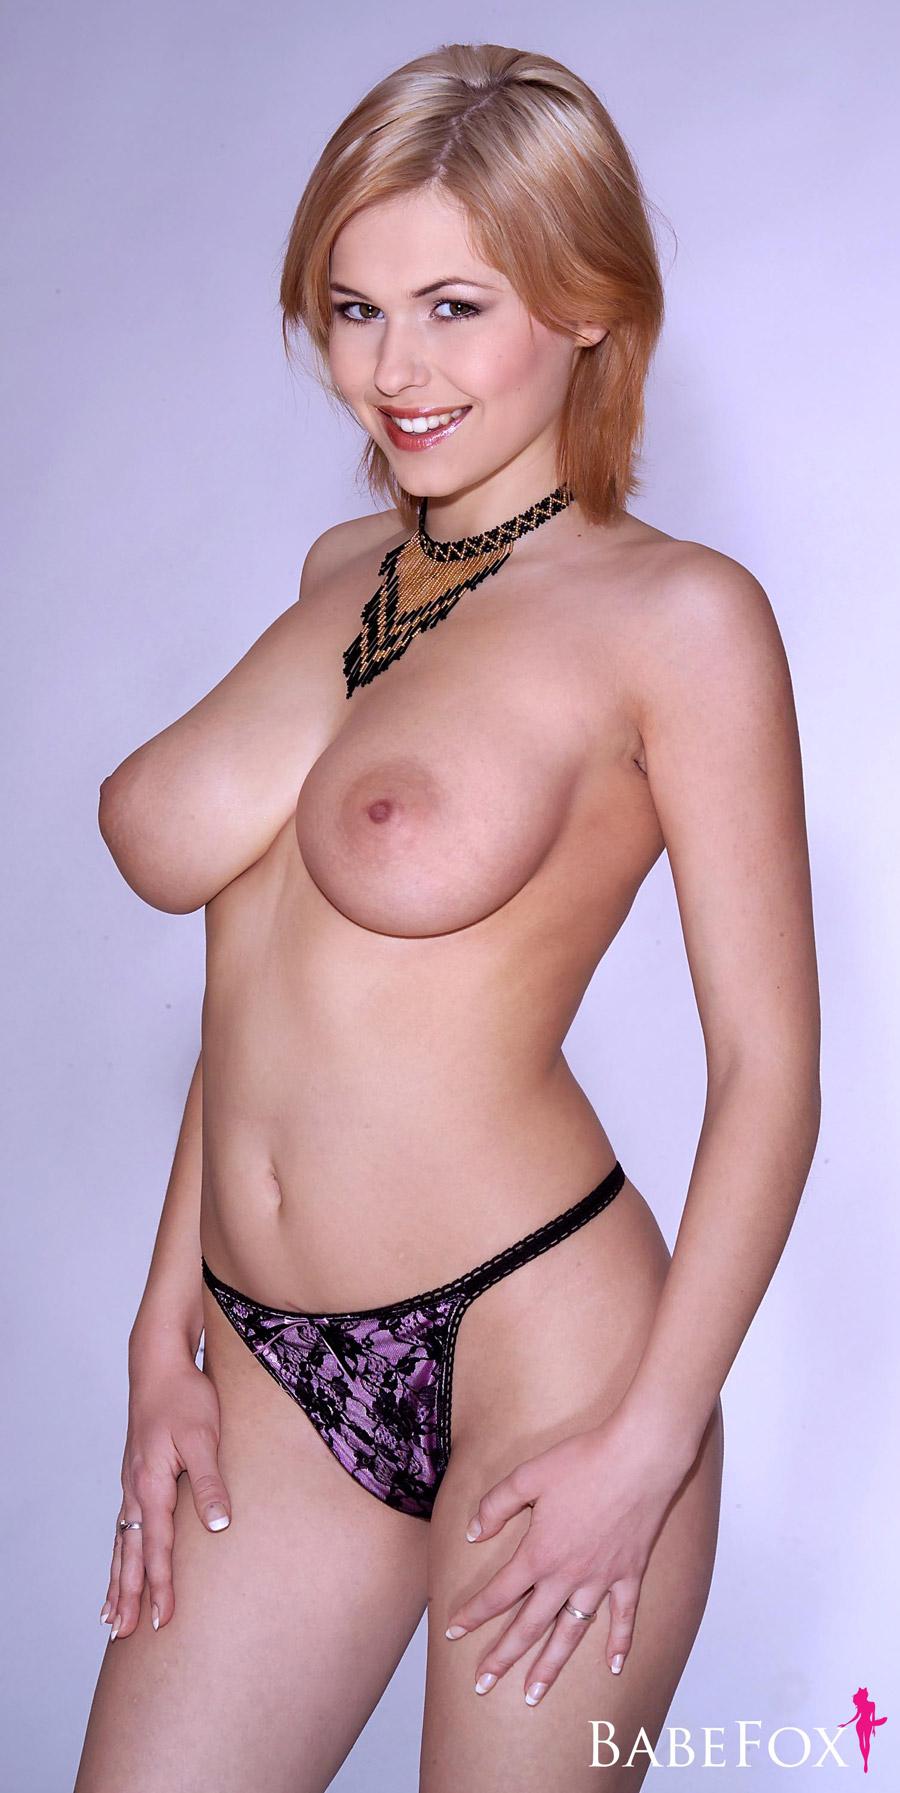 Leamington spa/warwick Girls Nude Celebs Forum,Natasha poly lui magazine Erotic archive Gia marie 2019,Anastasiya scheglova 2019